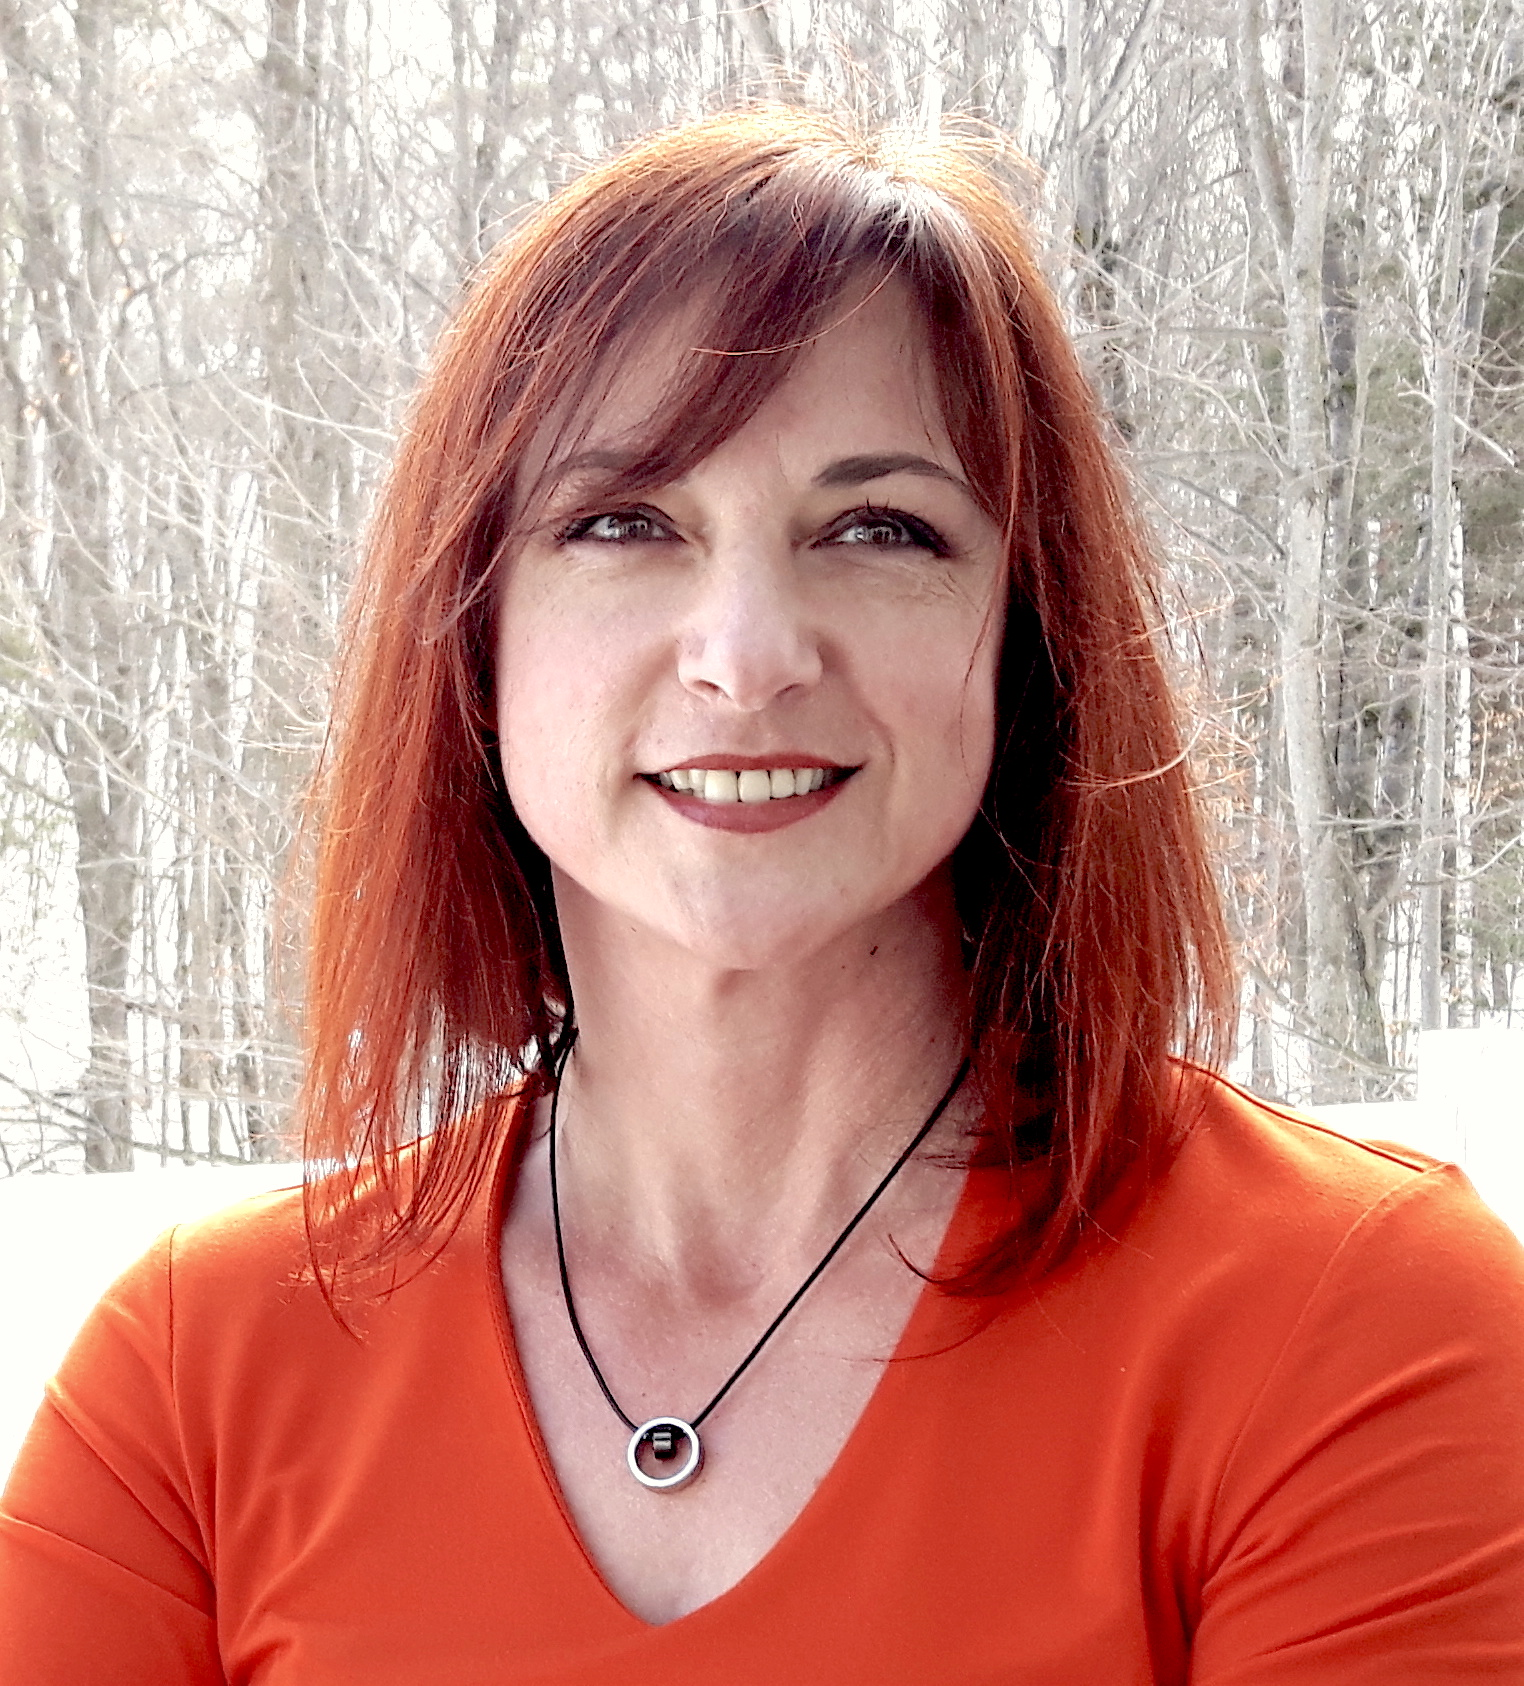 Marta Cepek